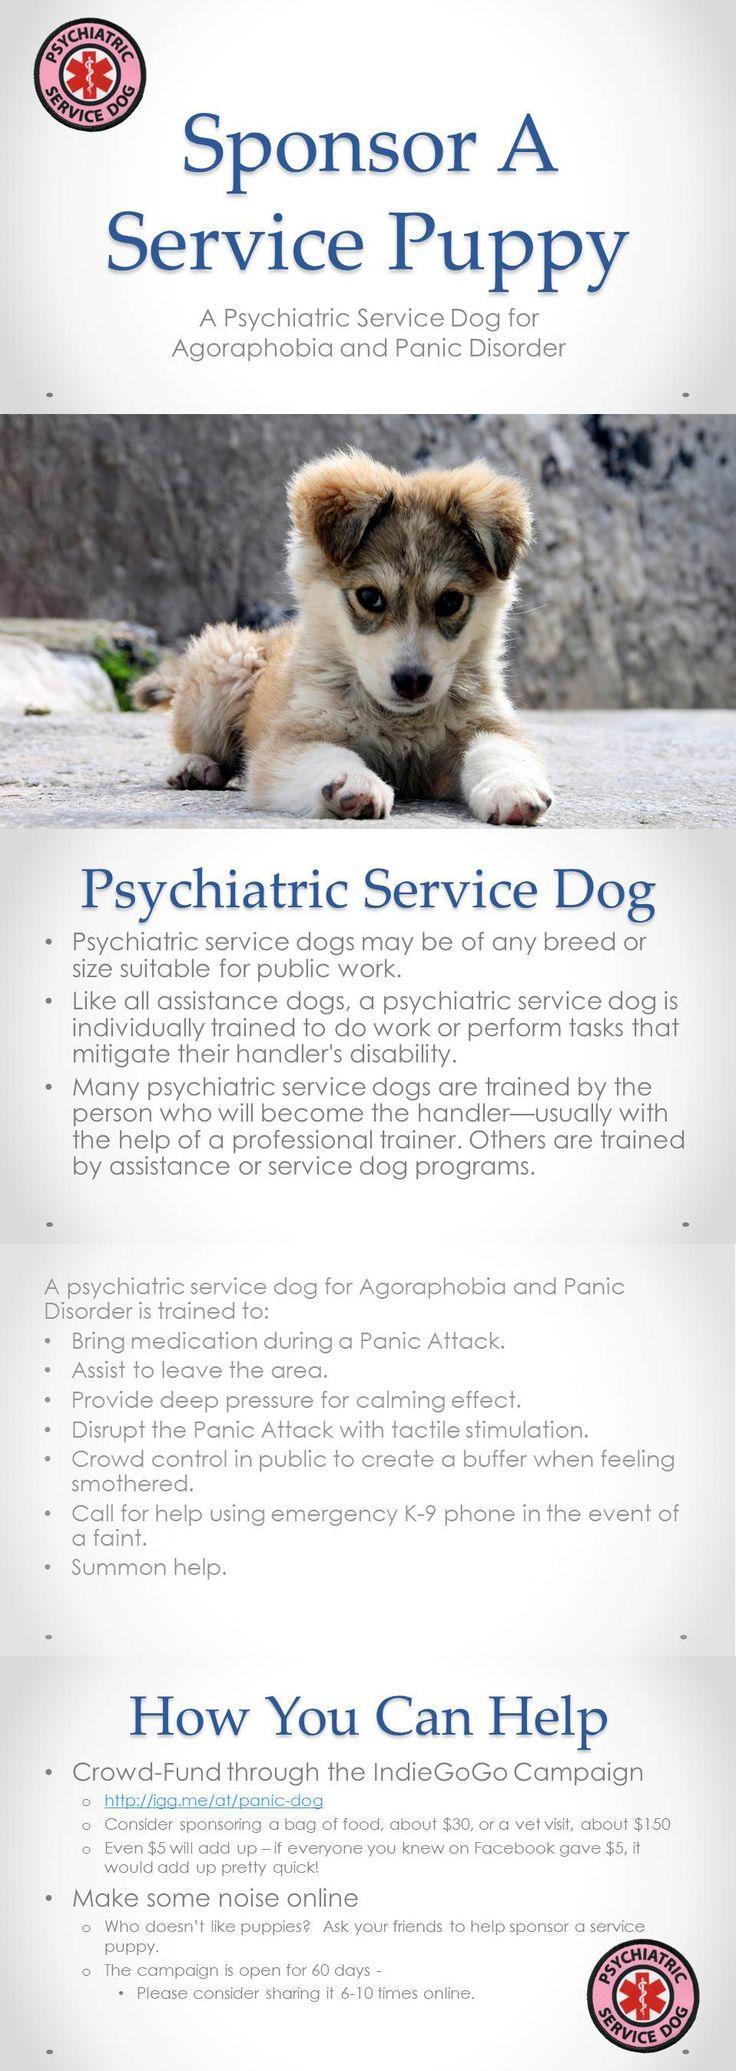 Psychiatric Service Dog Information on psychiatric service dogs and their tasks.  https://www.facebook.com/diyservicedog/ #servicedog